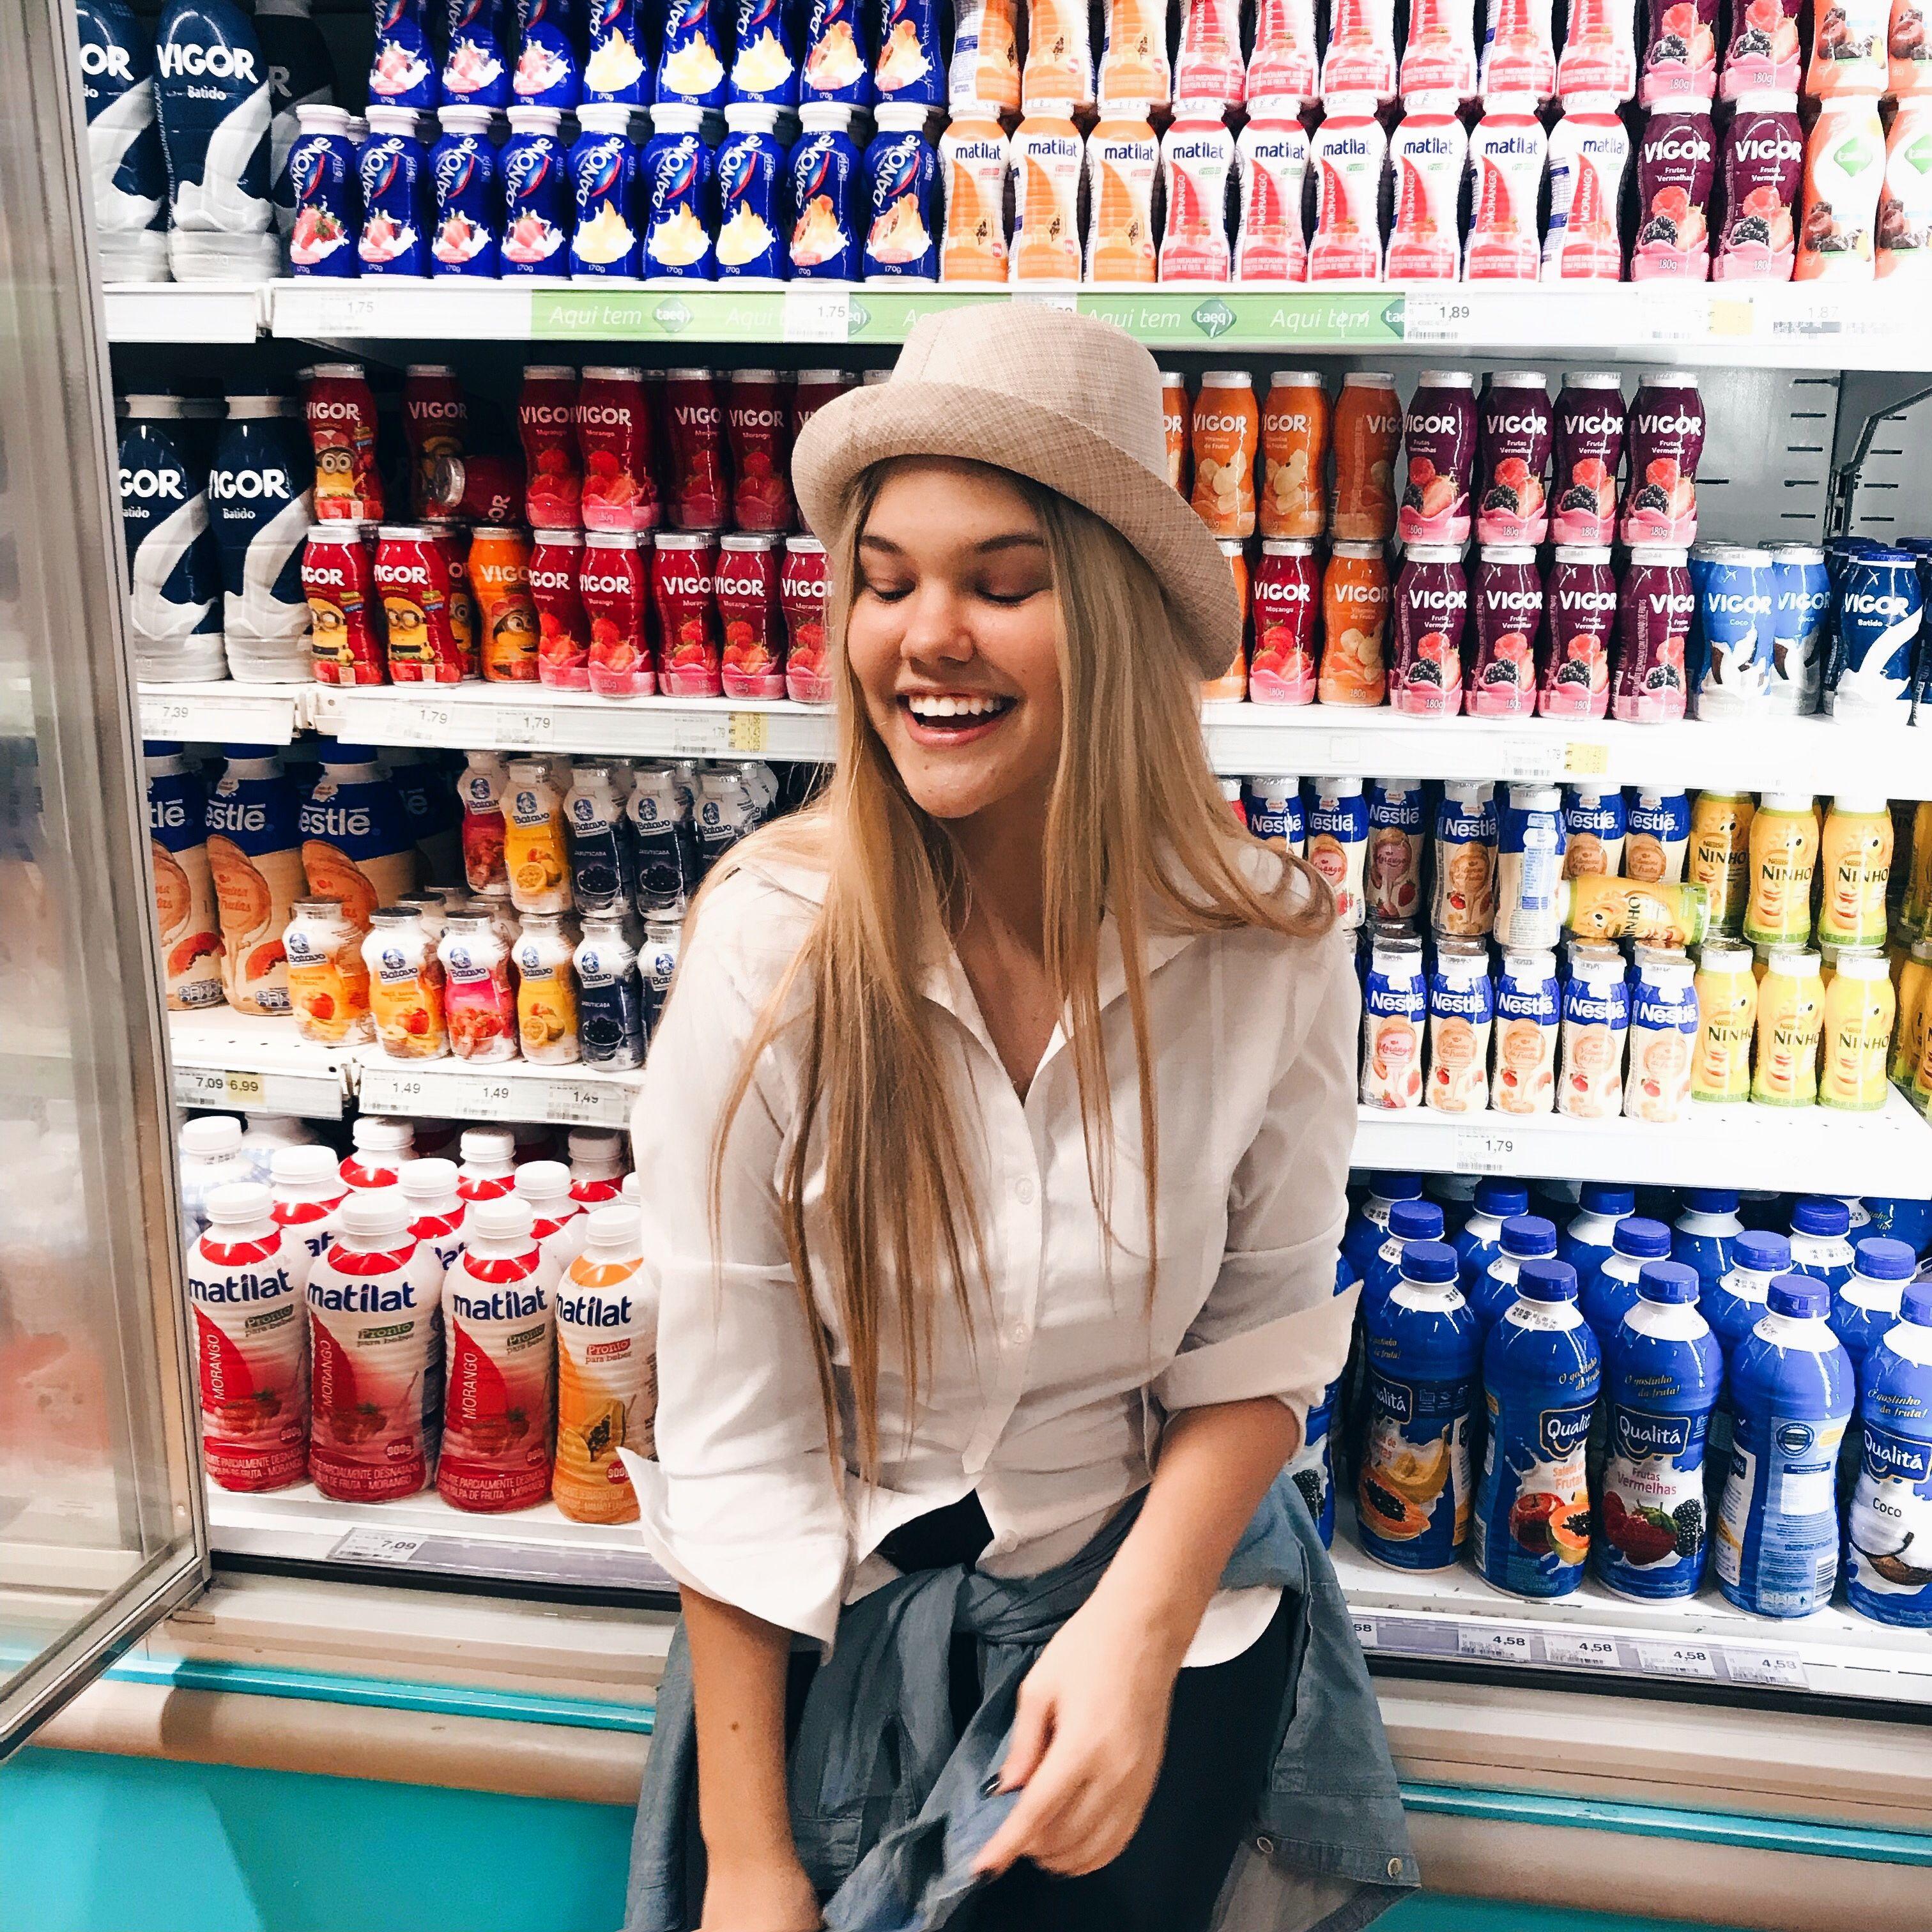 258461d2e32ac  supermarket  supermercado  chapéu  love  iogurte  drink  tumblr  milk   leite  iogurte  yorgut  hair  blondhair  lovely  smile  espontanea   mercado  bebidas ...